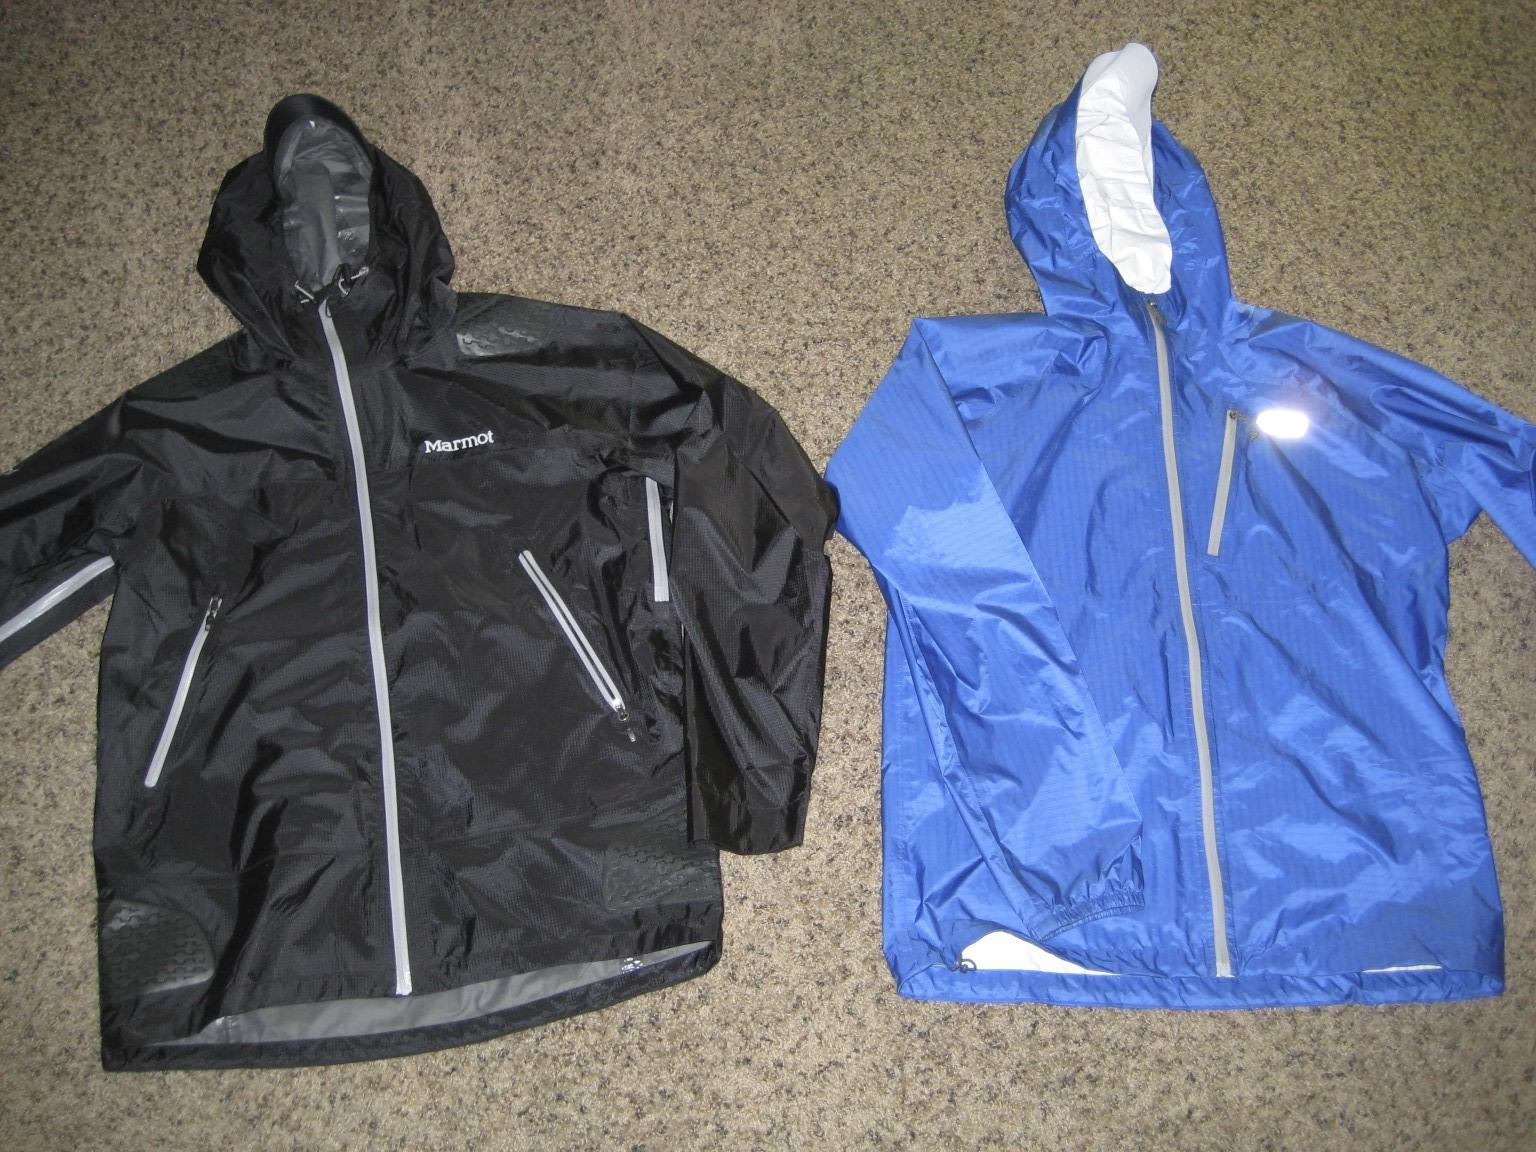 gear 30 or helium vs marmot super mica ultralight rain jacket review